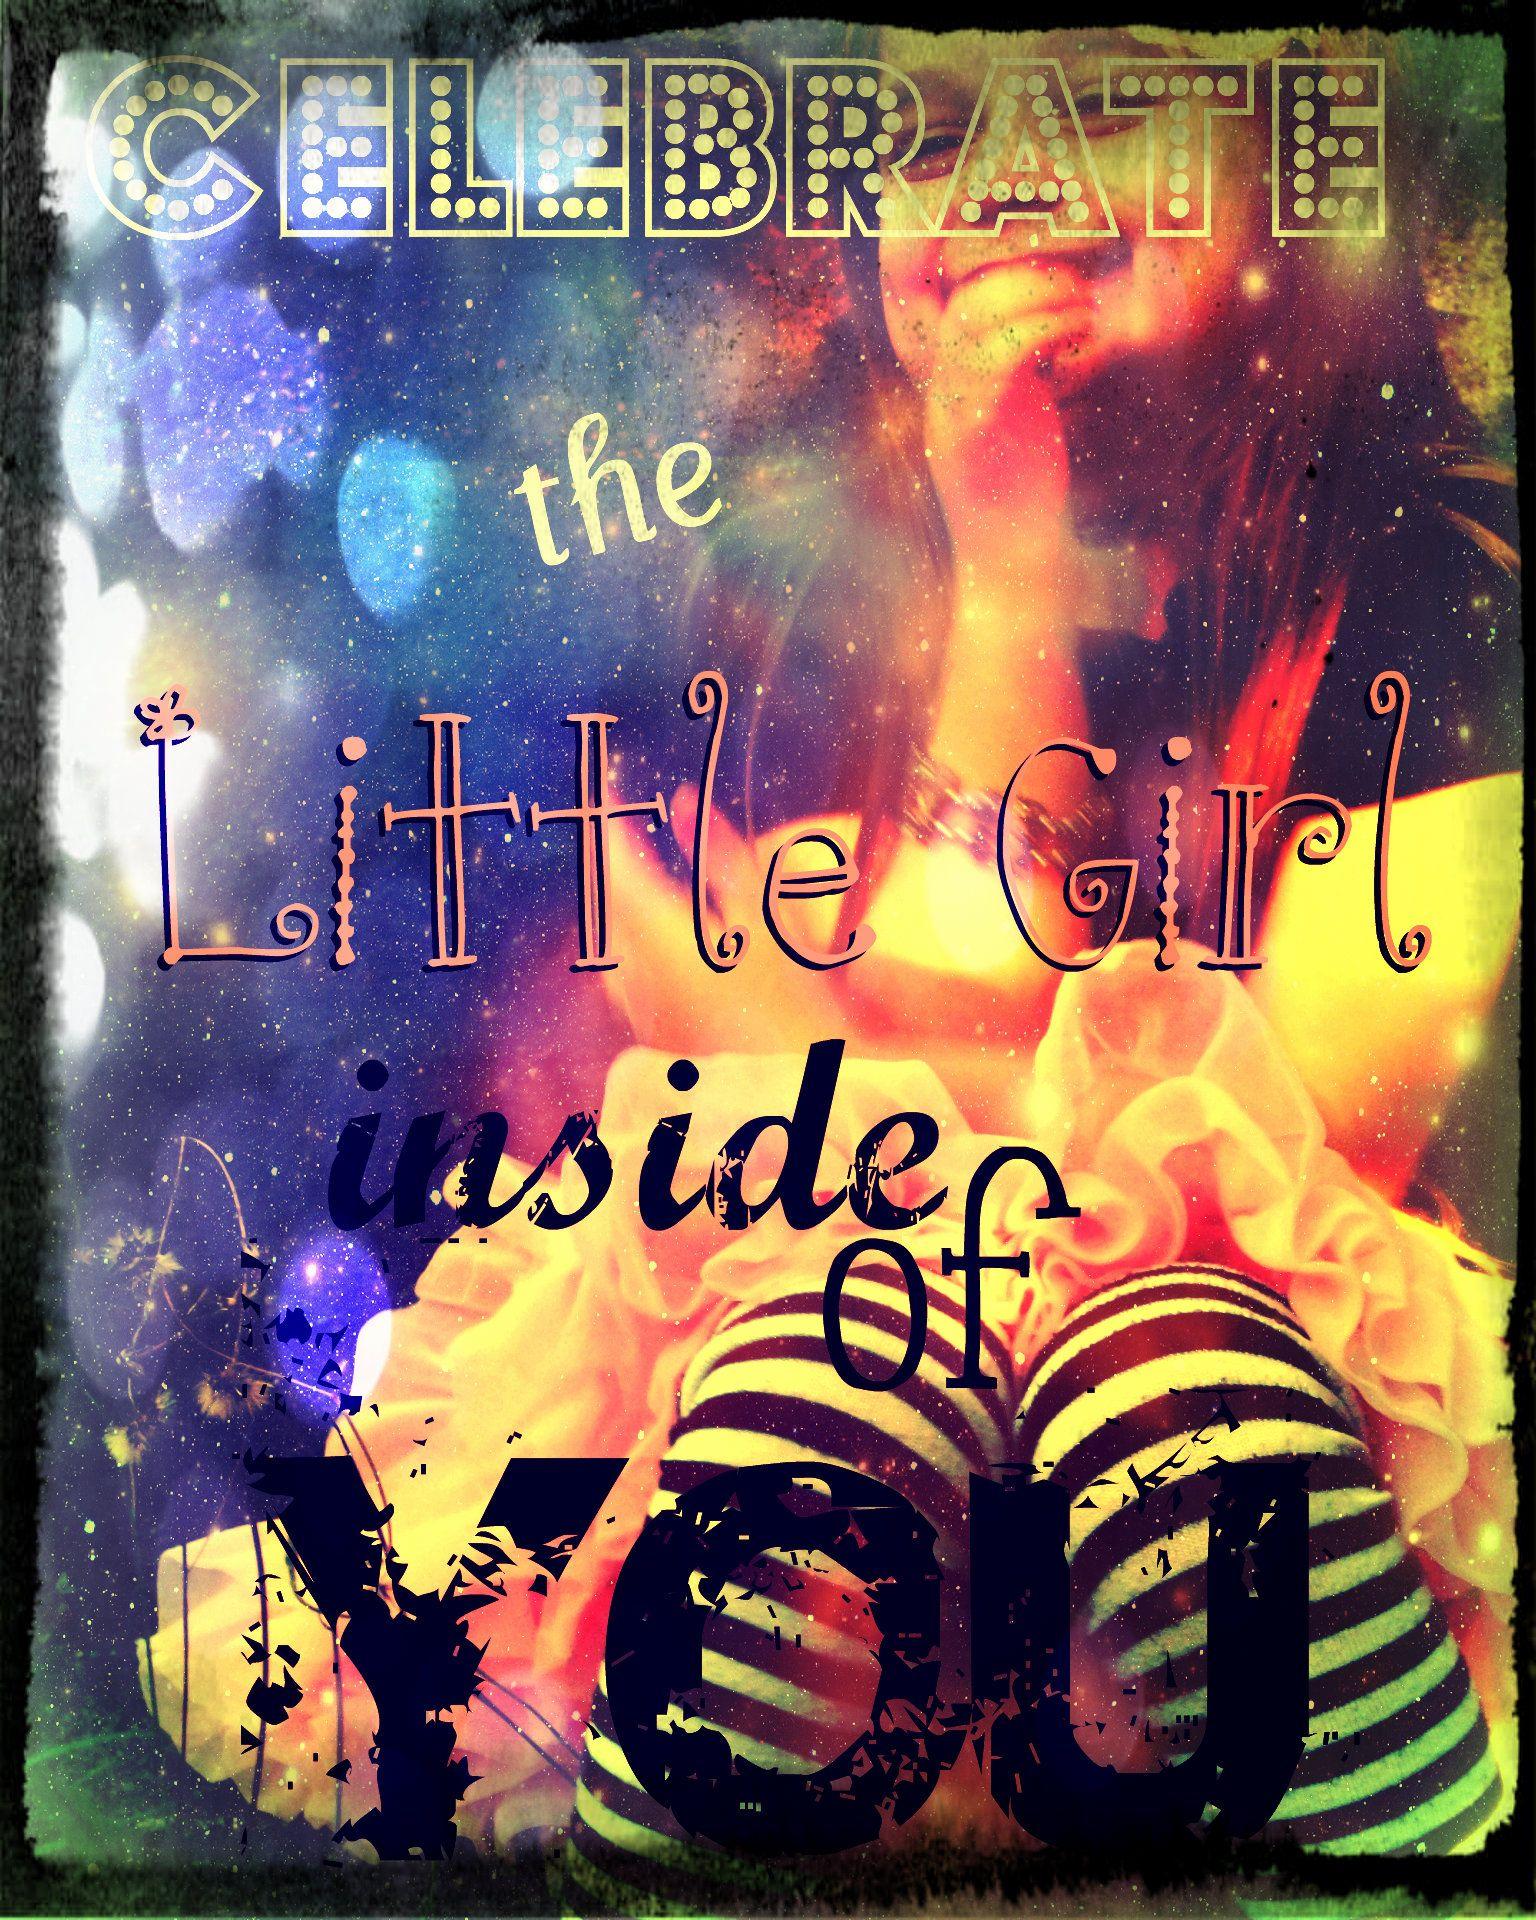 """Celebrate The Little Girl Inside Of You"" by Linda Tellier of Glitter & Grunge Studio; Arts Guild of Woonsocket member."